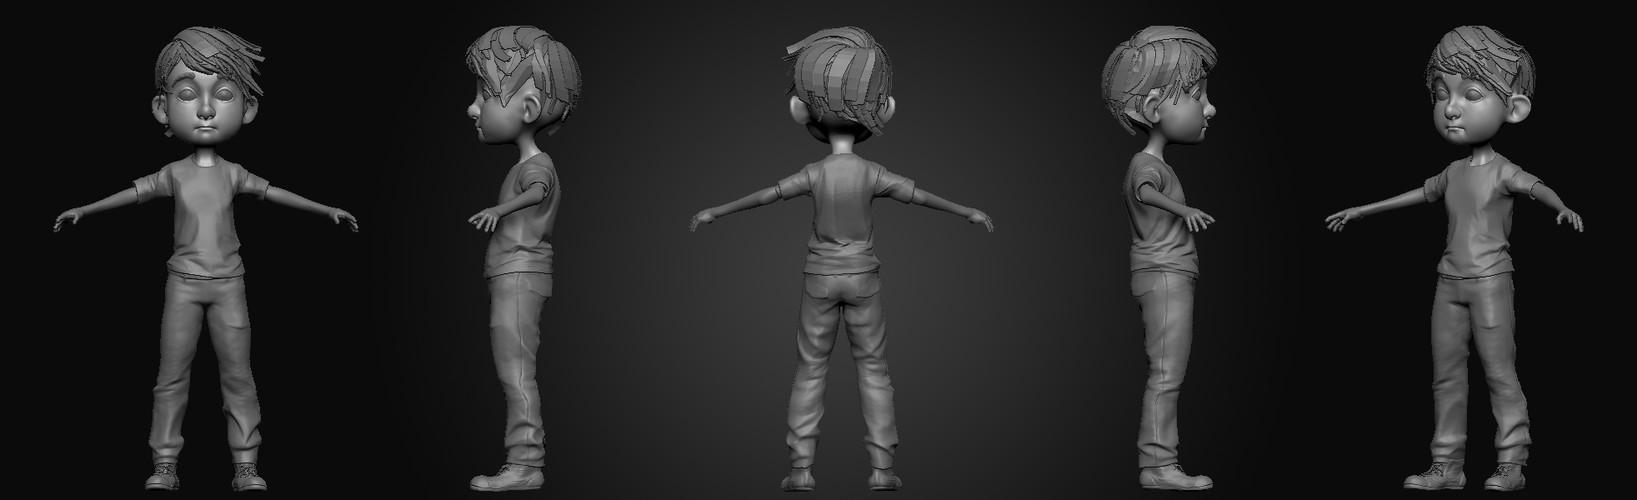 CharacterStrip222.jpg